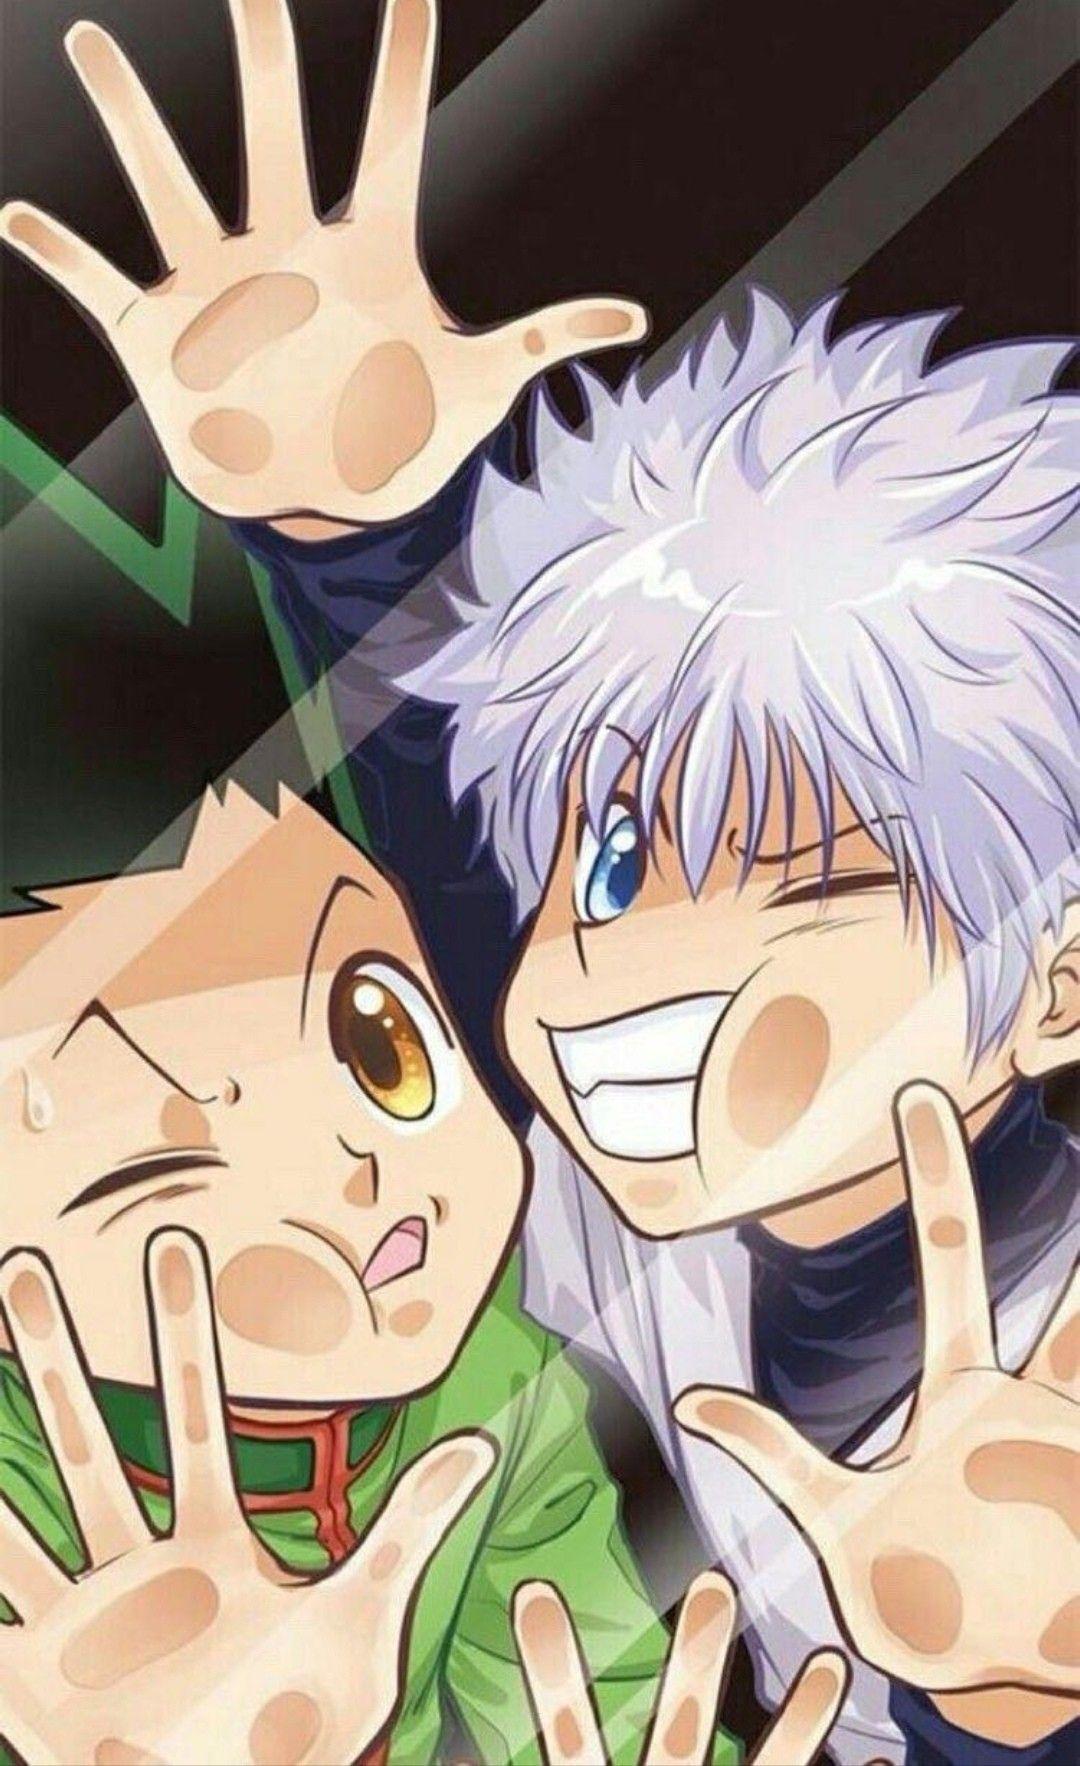 Epingle Par Flipaaax Grams Sur Hxh En Fond D Ecran Dessin Fond D Ecran Dessin Anime Fond D Ecran Telephone Manga